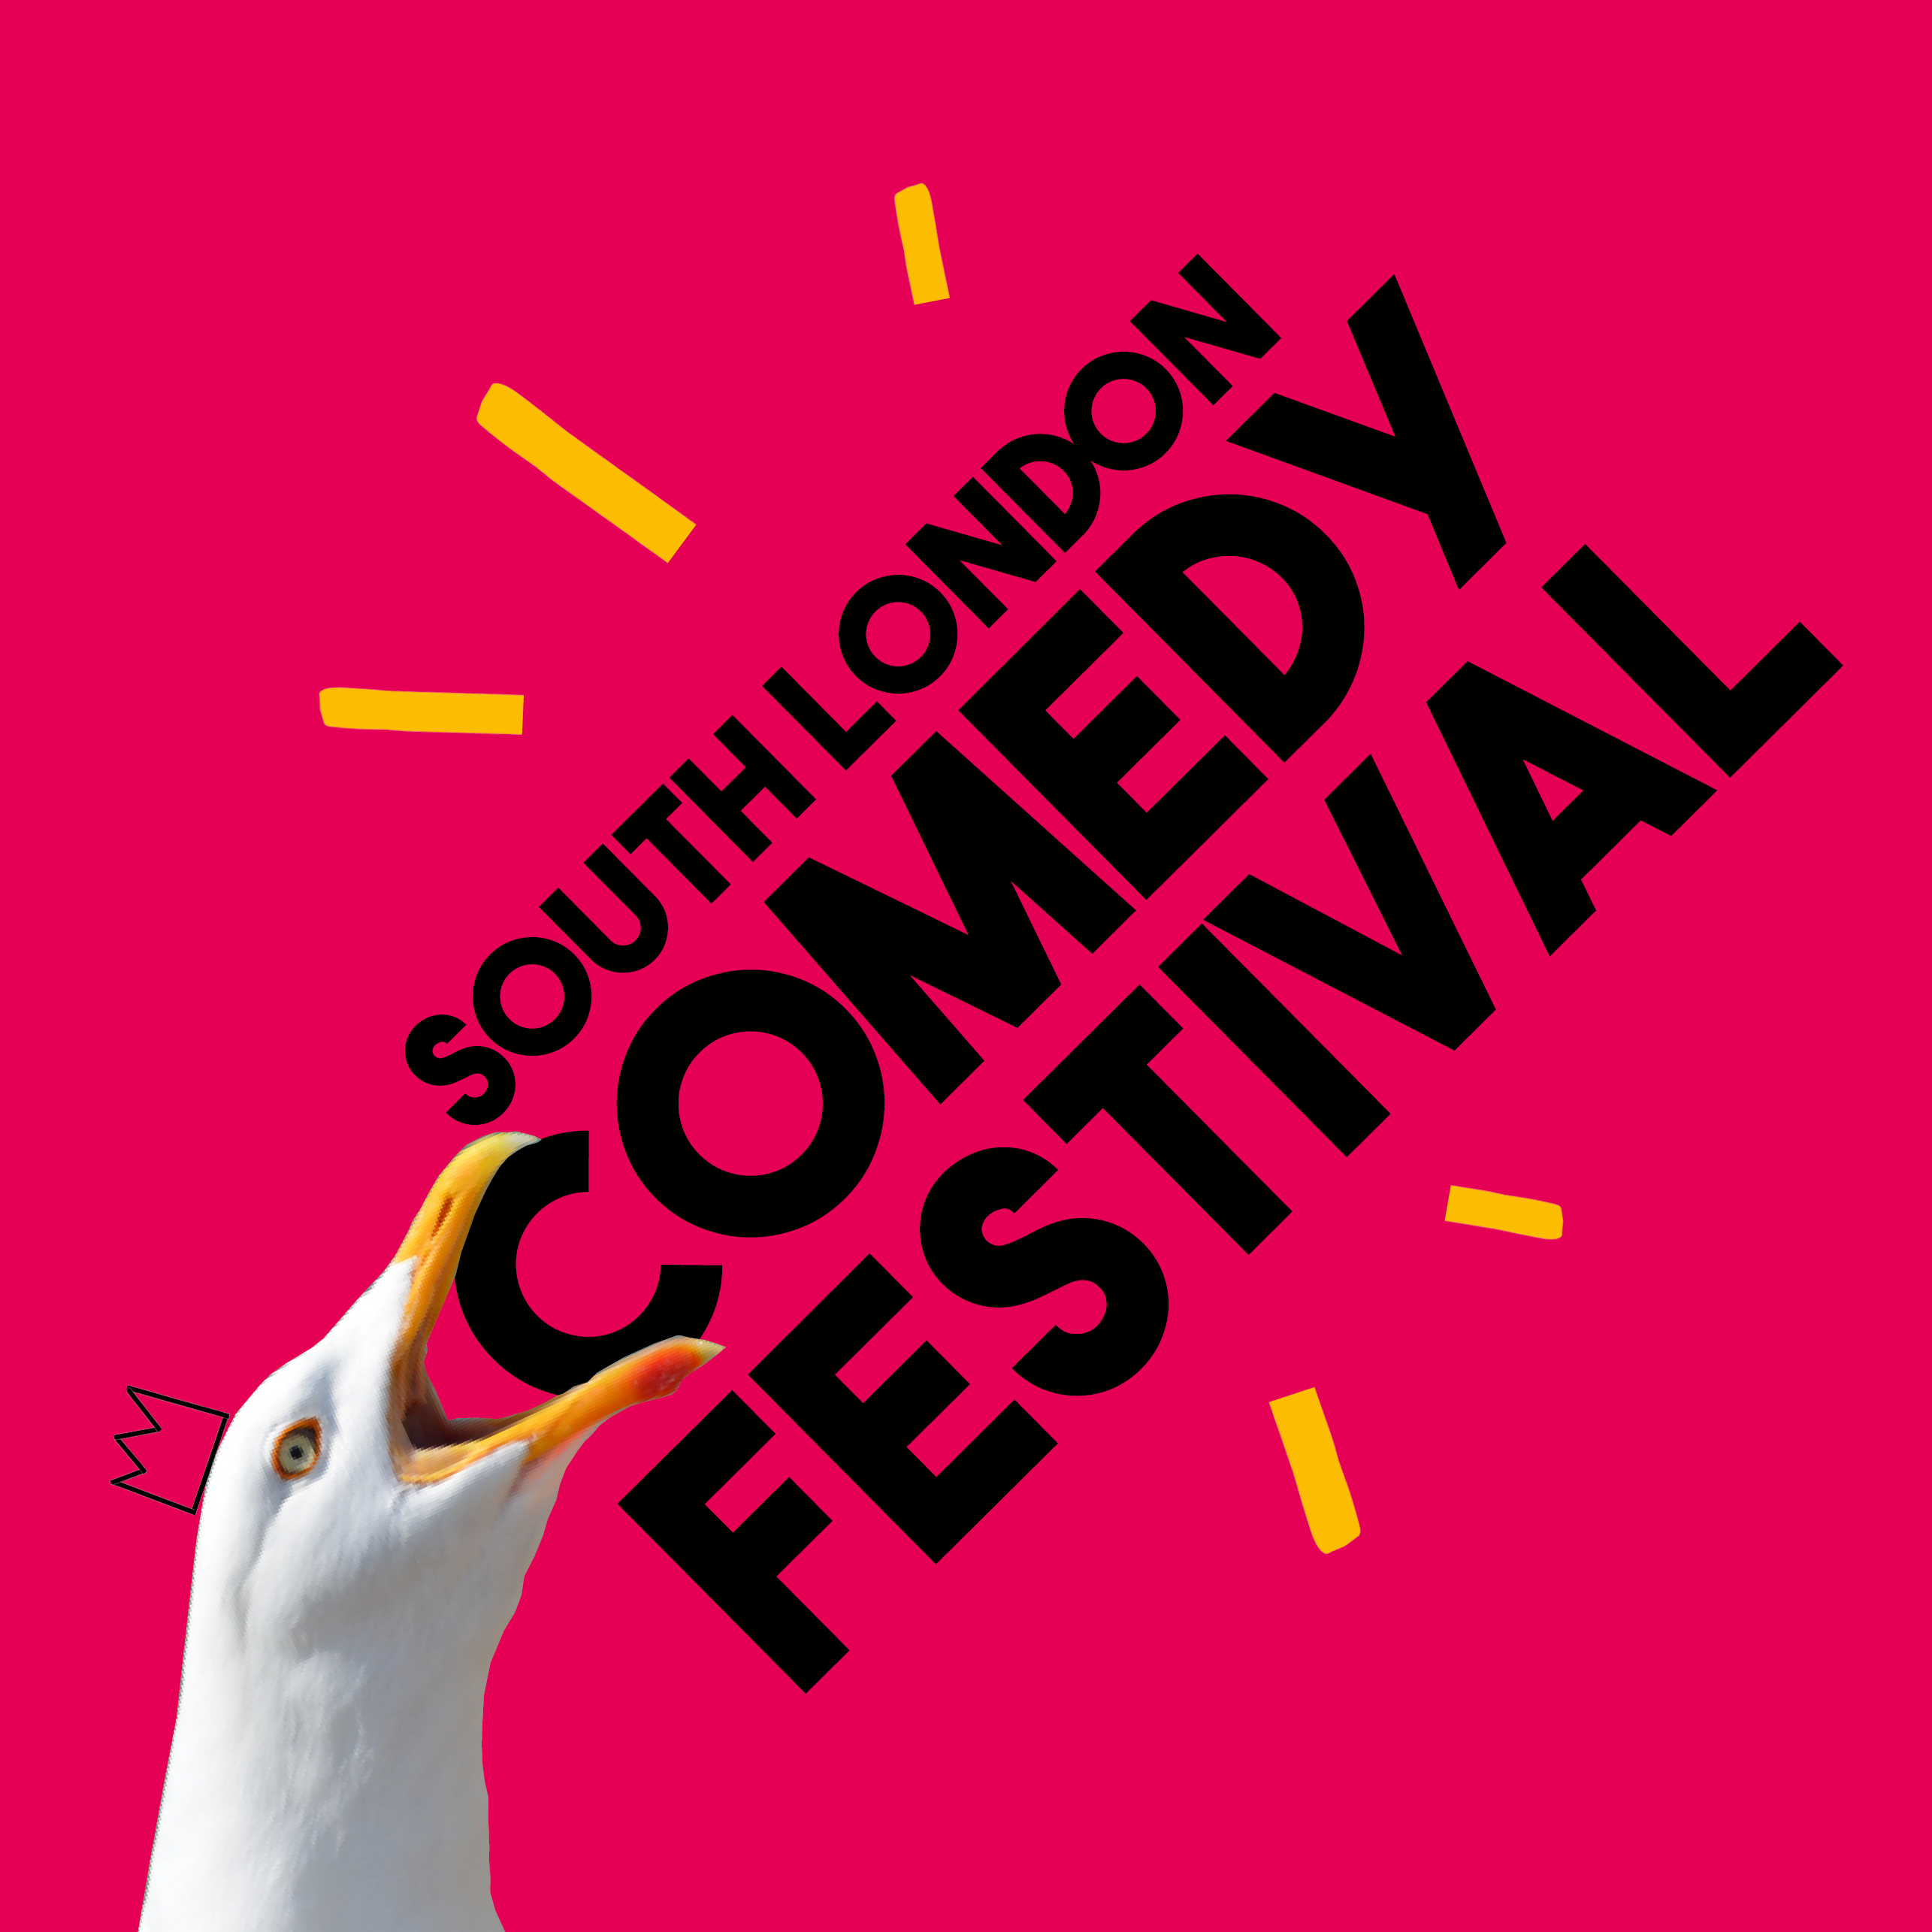 Comedy logo jul 1 45